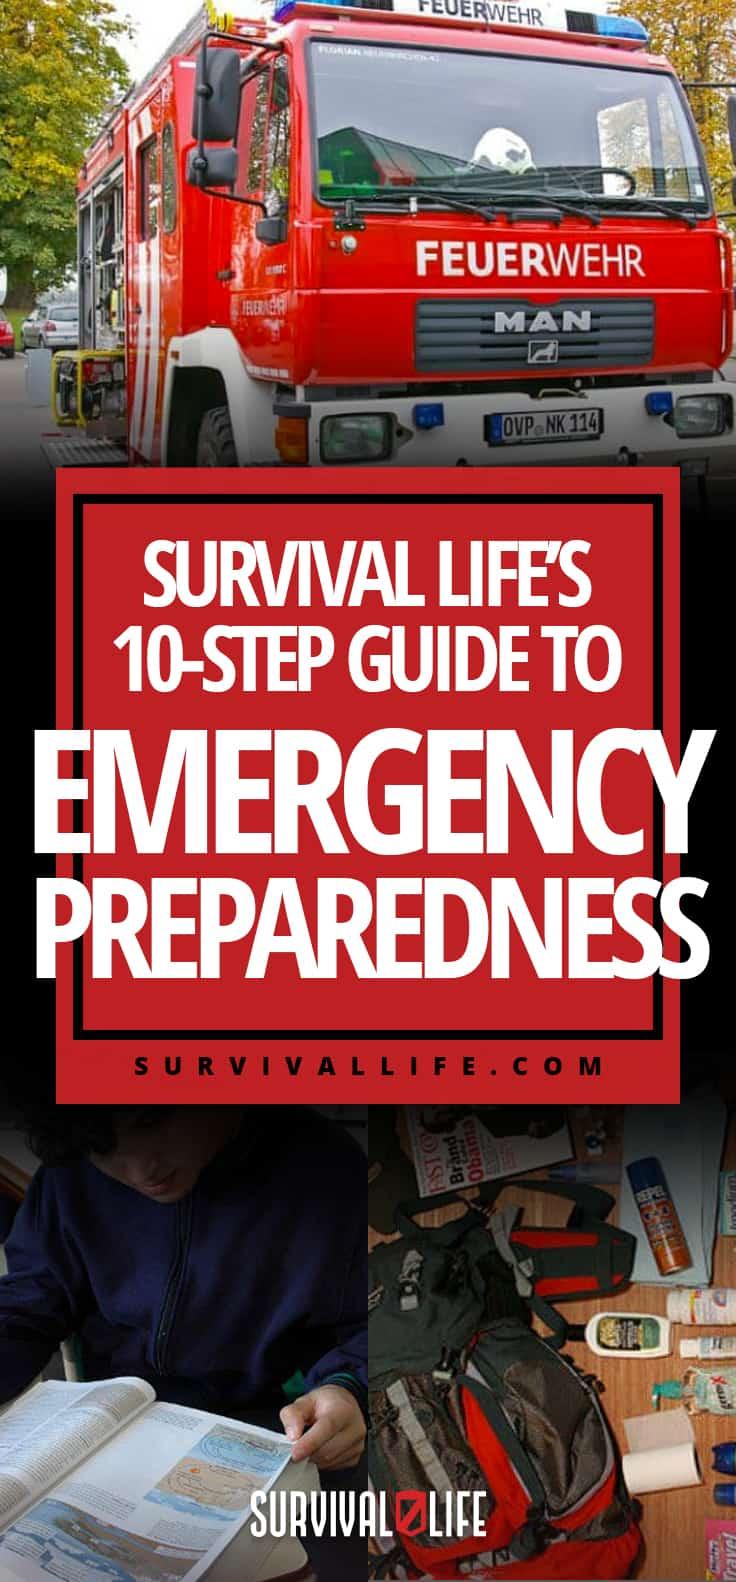 Survival Life's 10-Step Guide To Emergency Preparedness